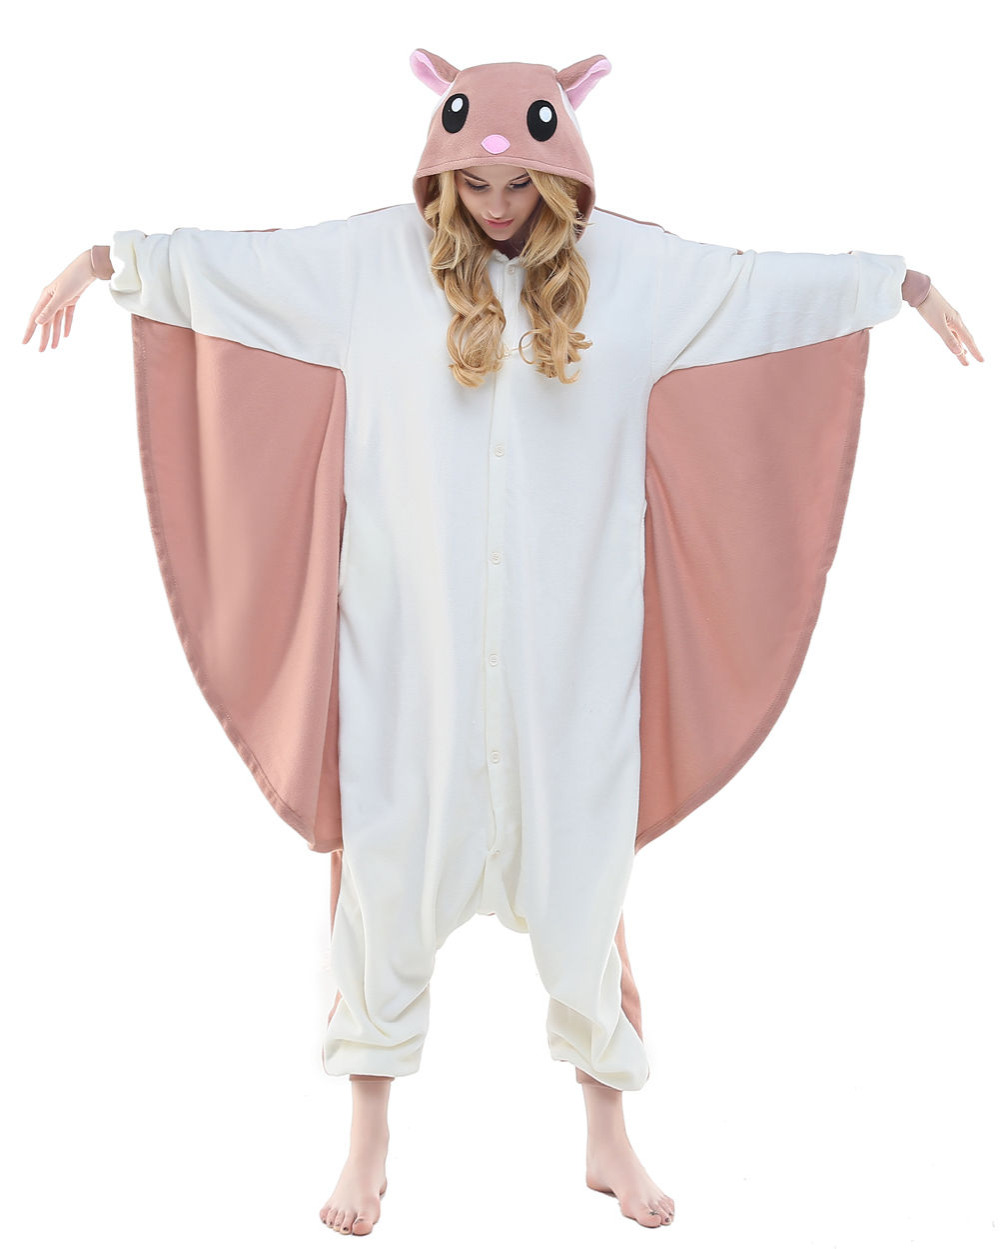 Unisex Adult Winter Spring Autumn Animal One-Piece Flying Squirrel Pajamas Animal Cosplay Costume Men Women Sleepwear Dress Robe